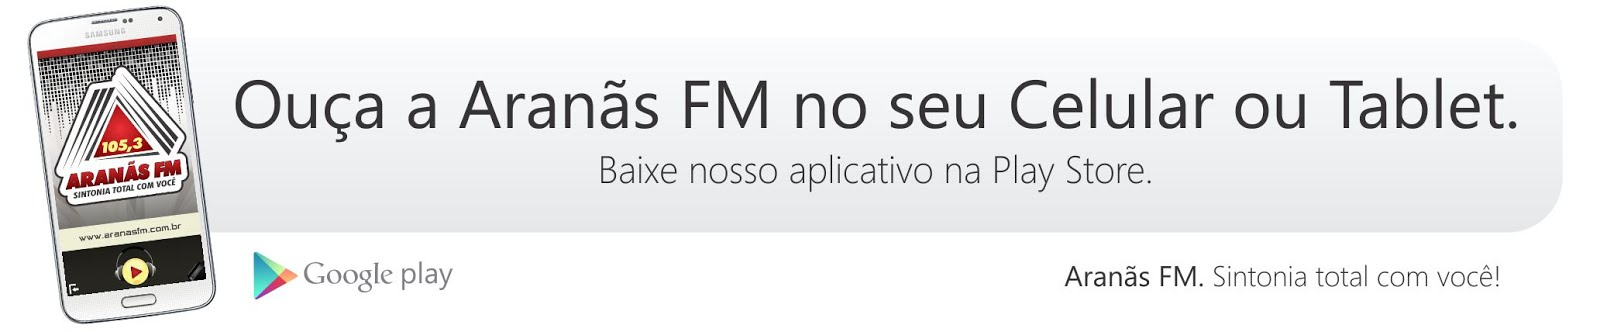 O Programa Canta Minas pode ser ouvido através da internet